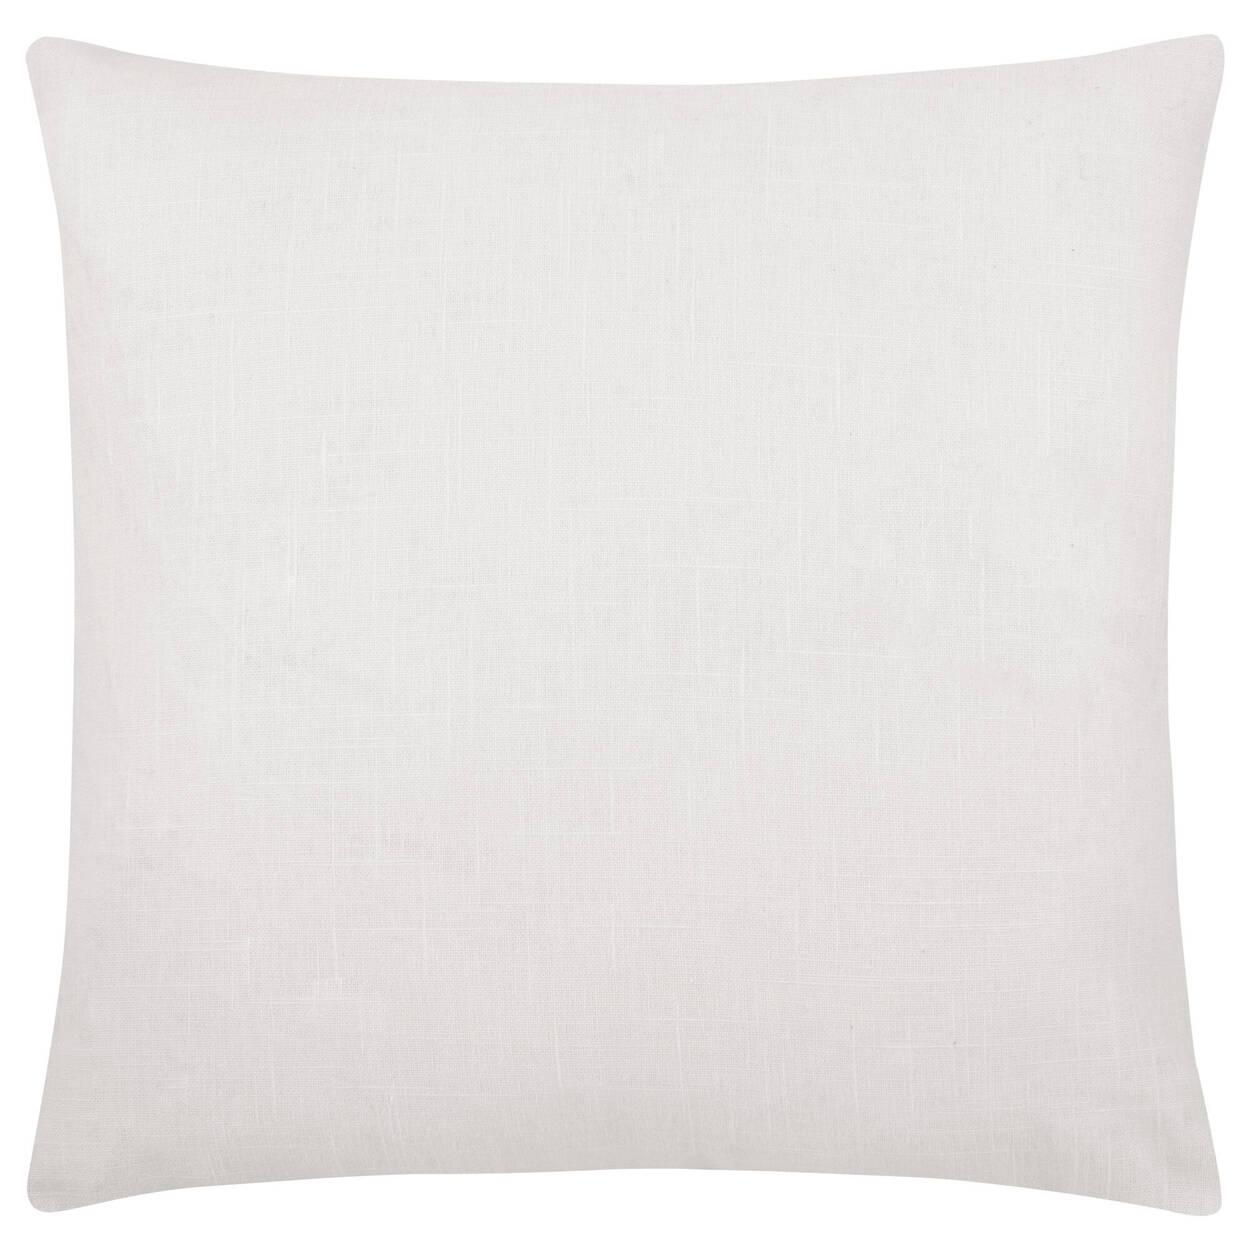 "Heily Decorative Pillow 19"" x 19"""